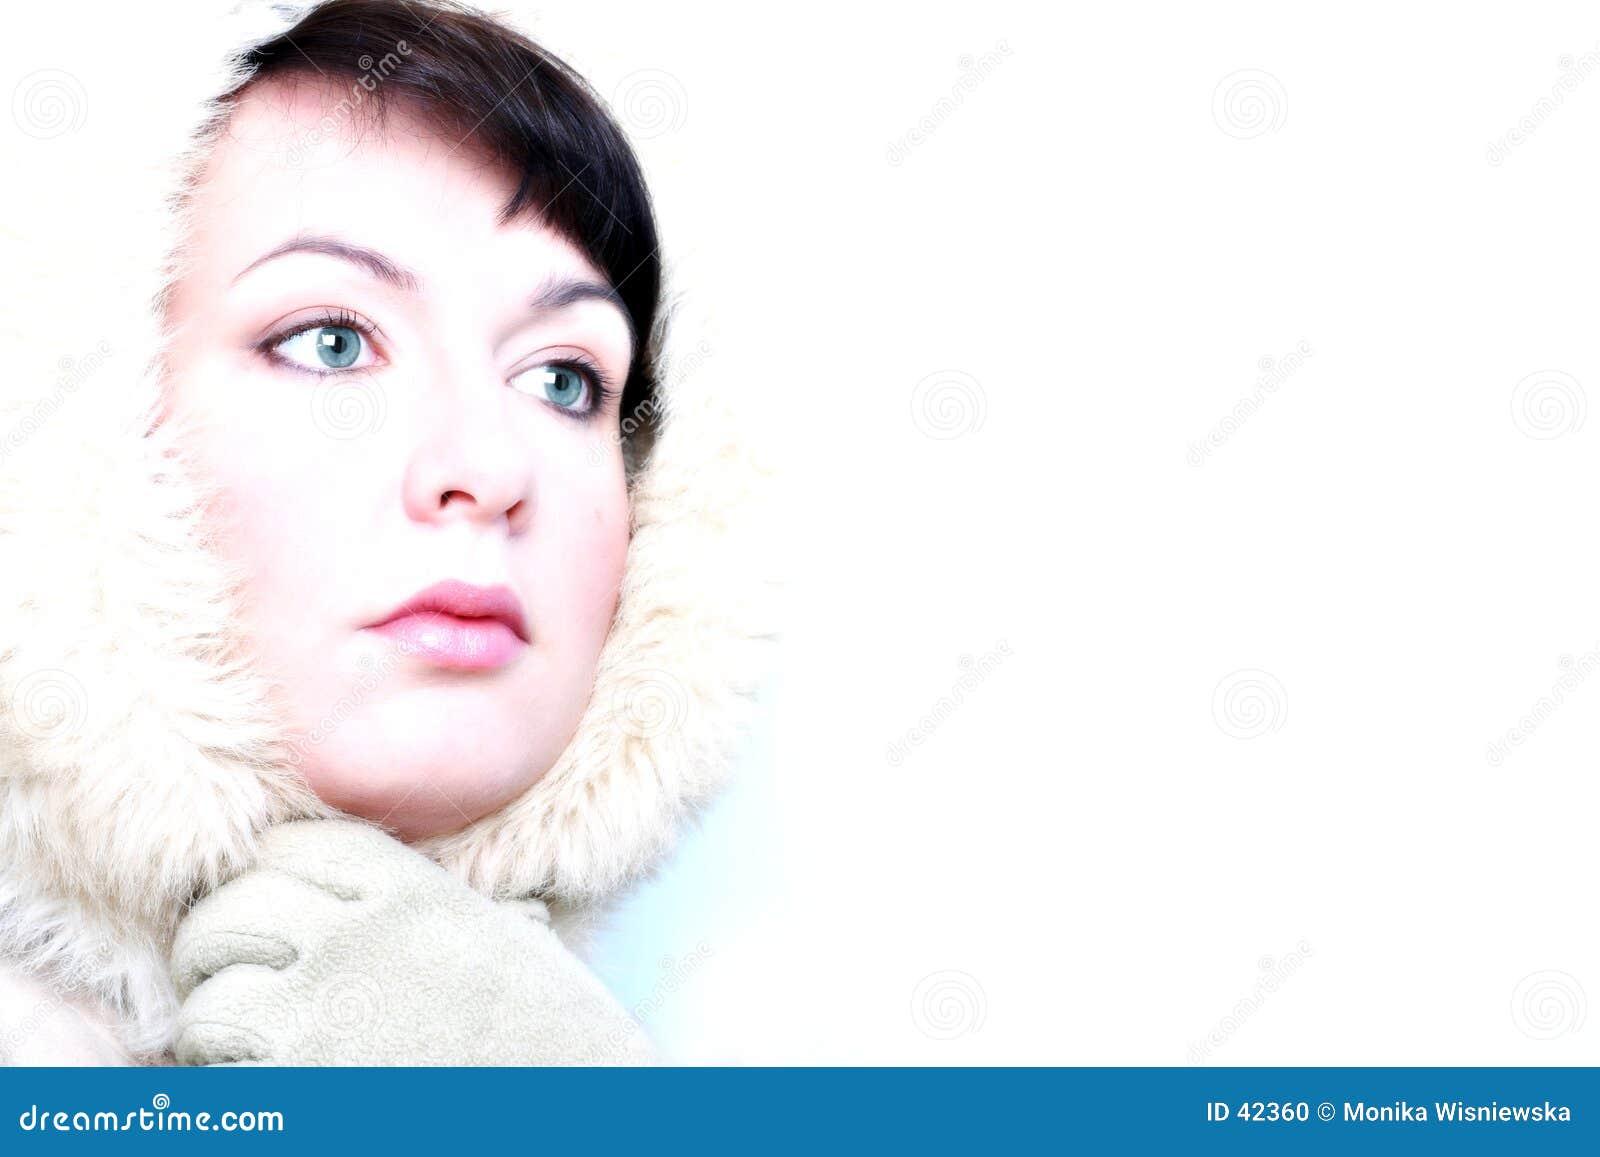 Winter Girl - Ice Look